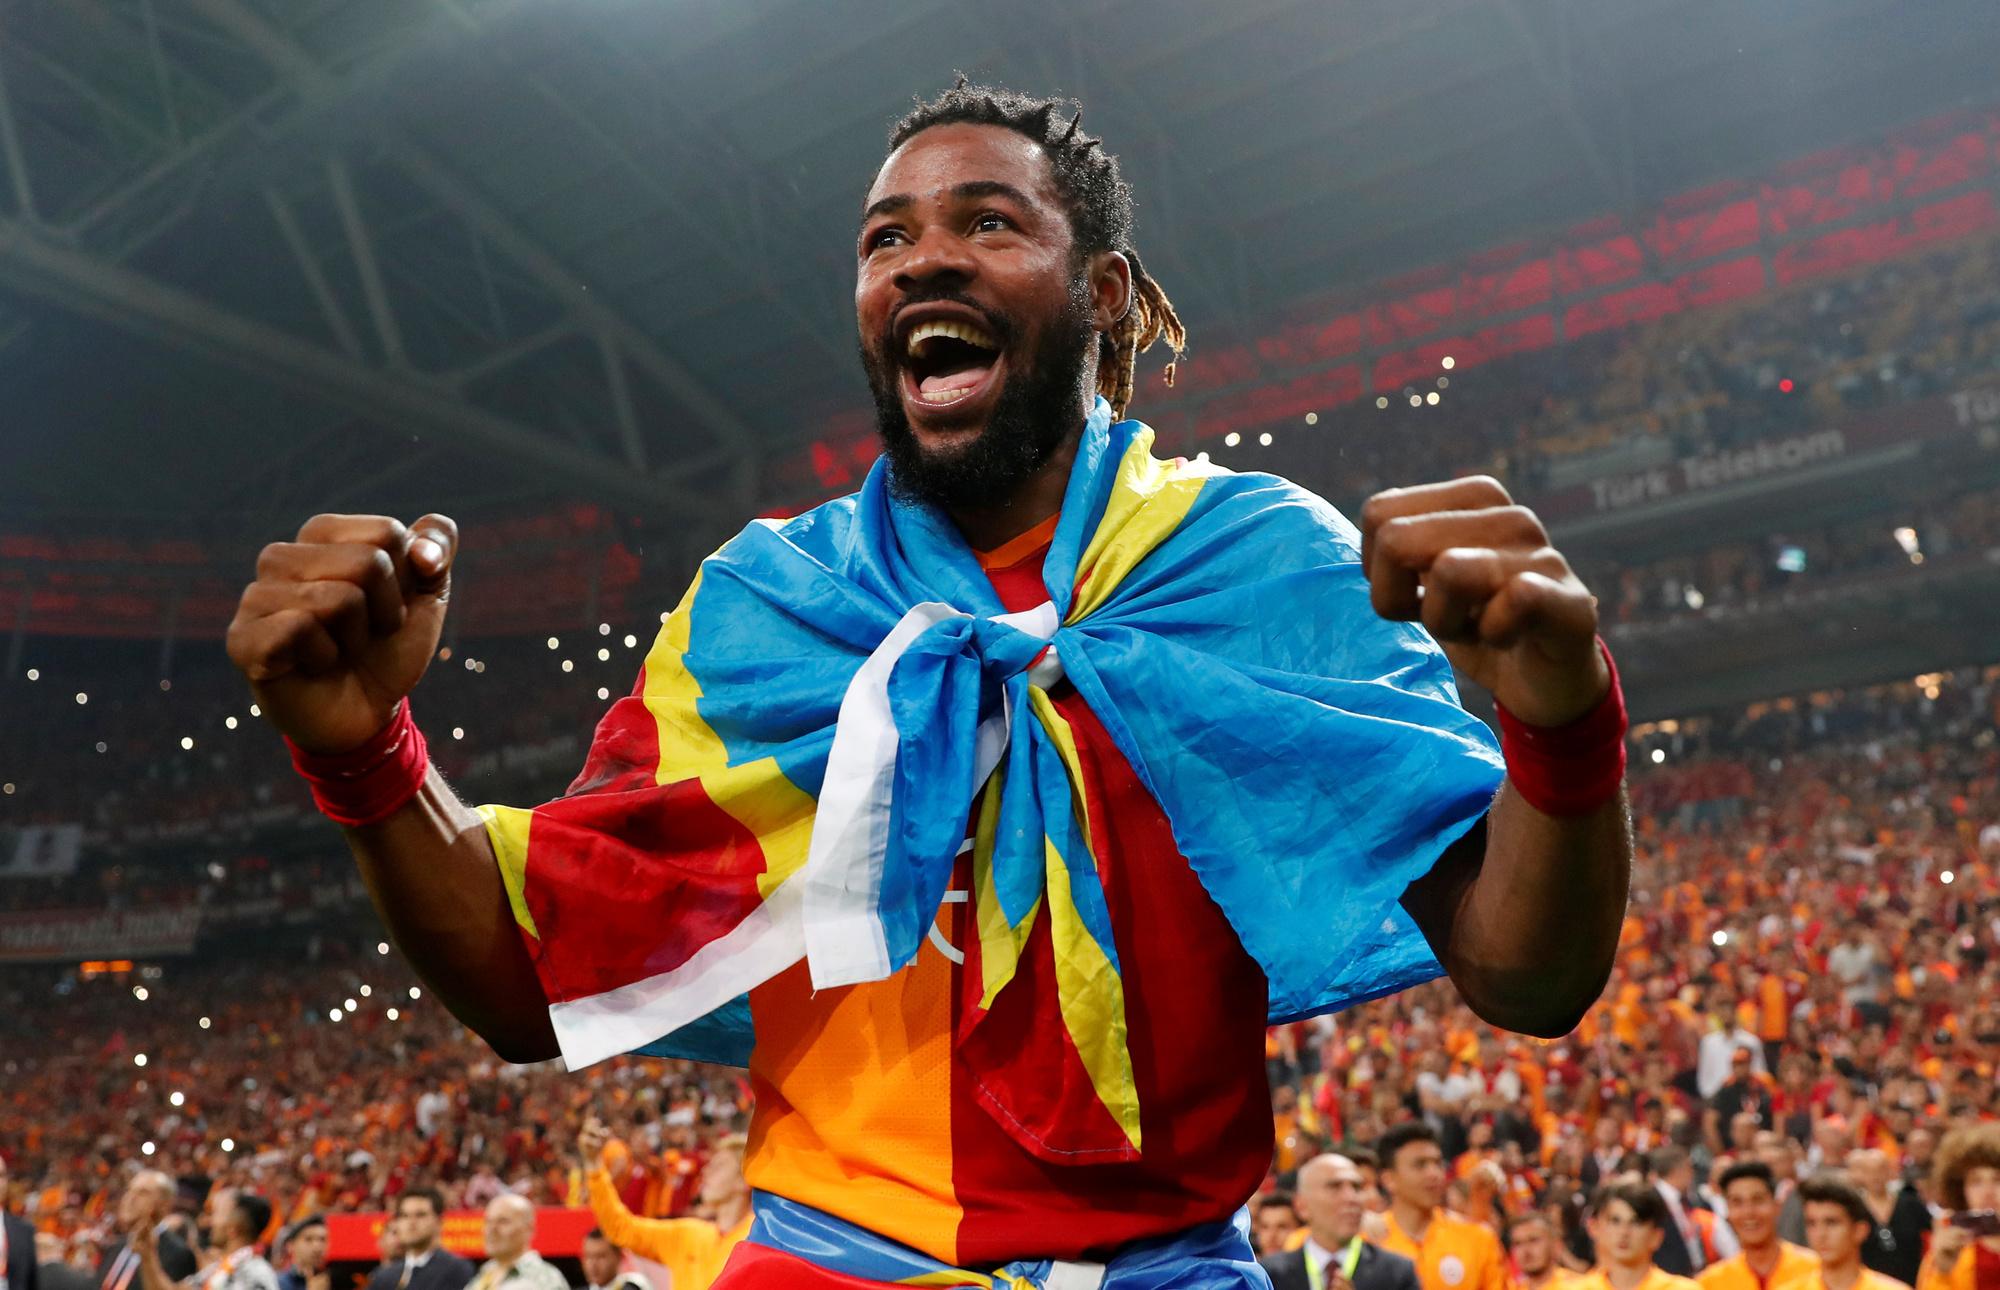 Luyindama signe pour trois ans à Galatasaray - Foot international -  Sportmagazine